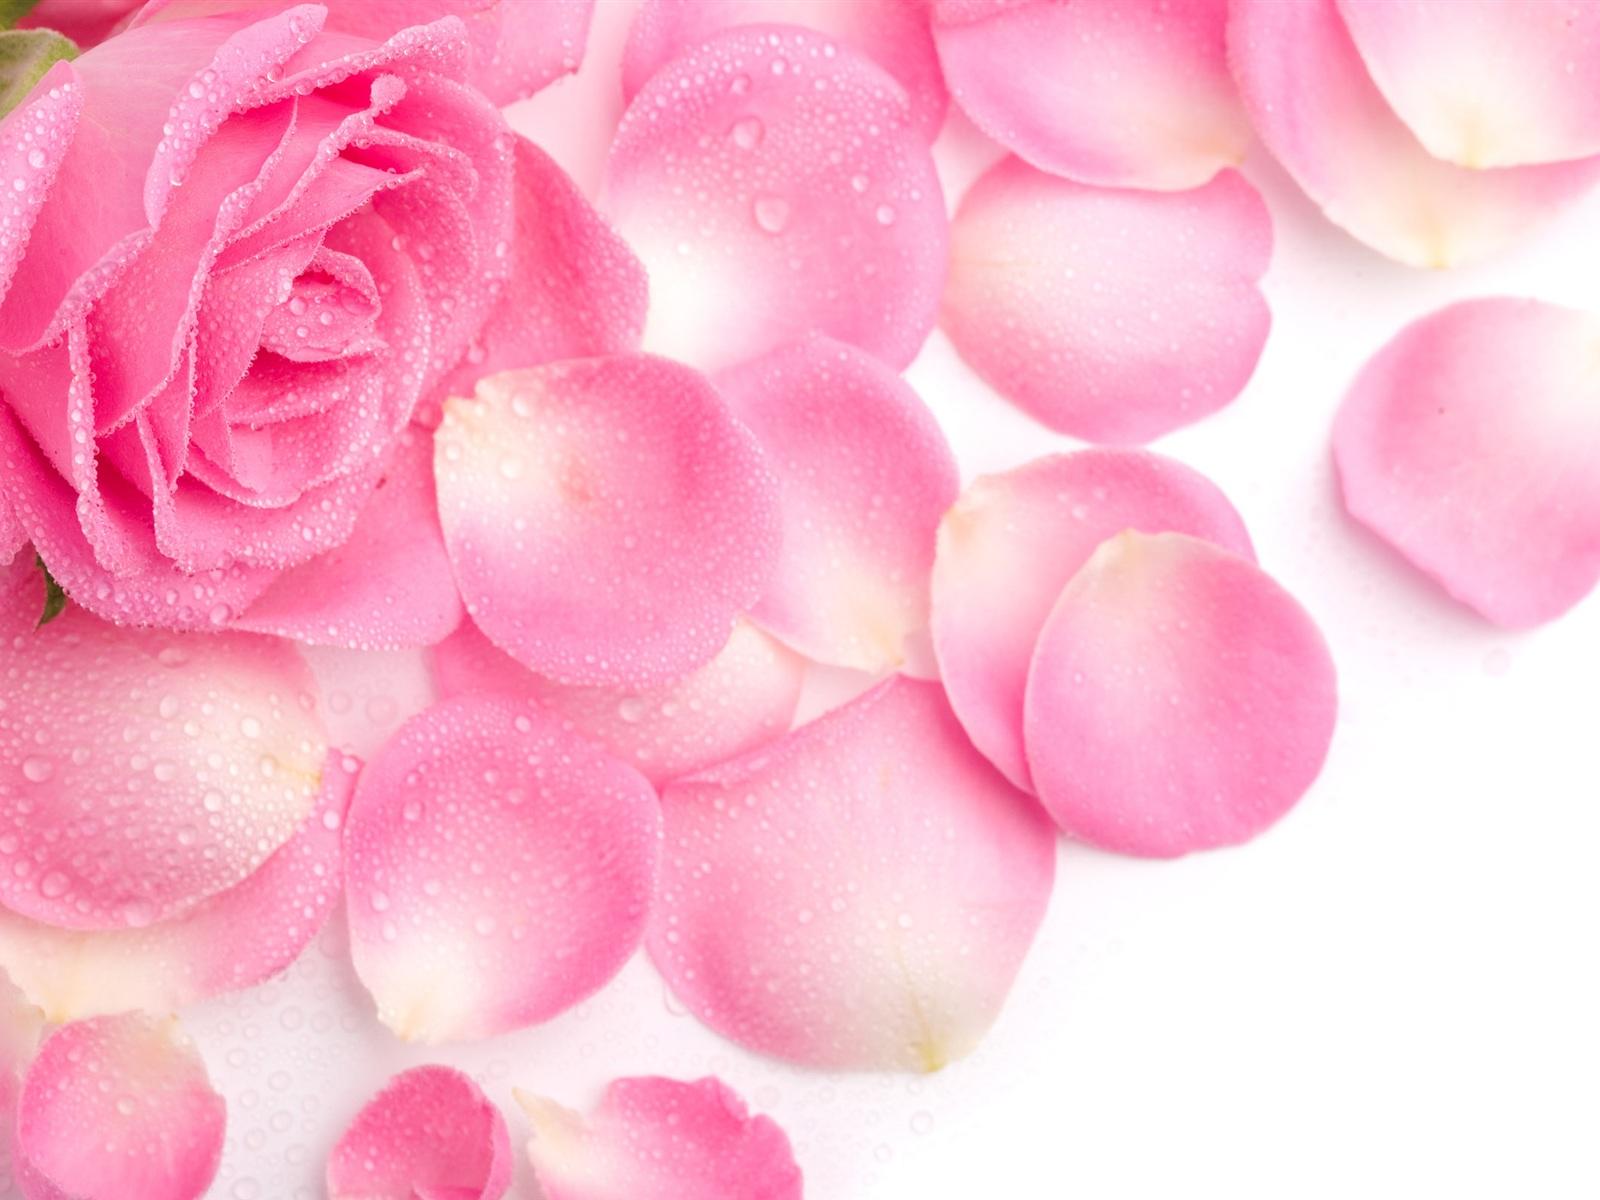 Rose Petal Wallpaper Falling Light Pink Rose Petals